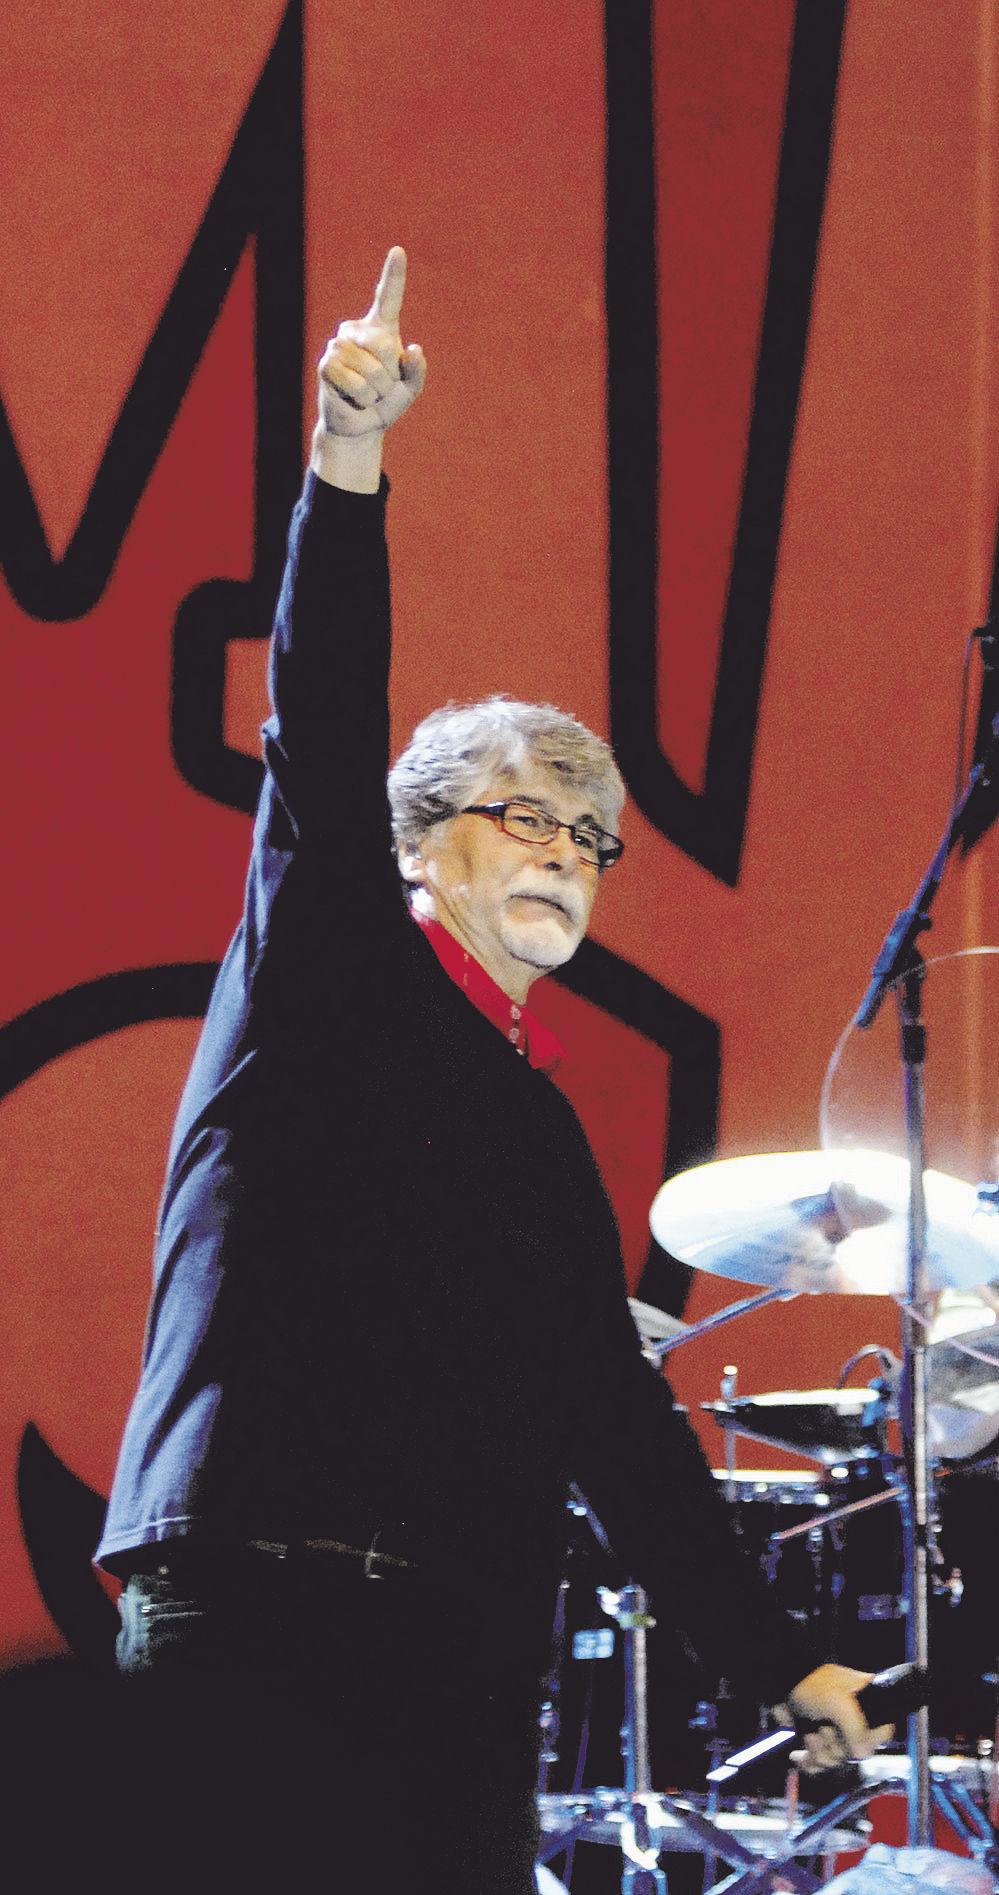 Alabama celebrates 50 years of country music at Tumbleweed